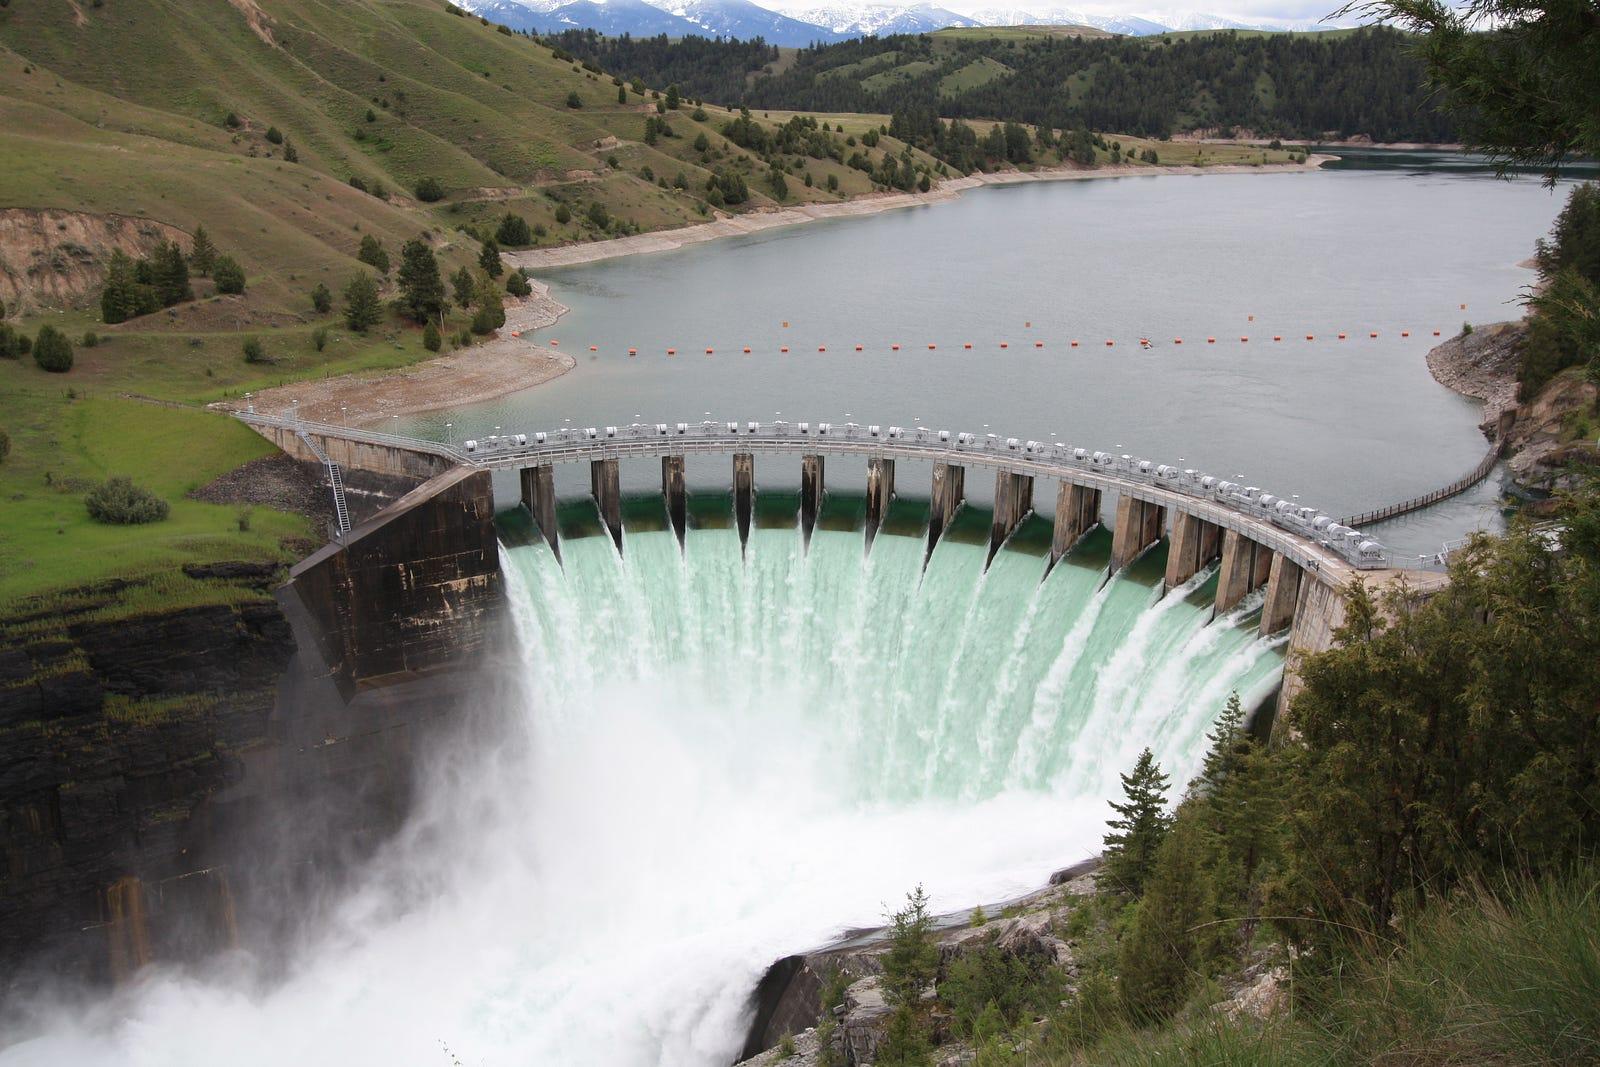 Ysis Dams Cause Climate Change Dams And Globalization Medium